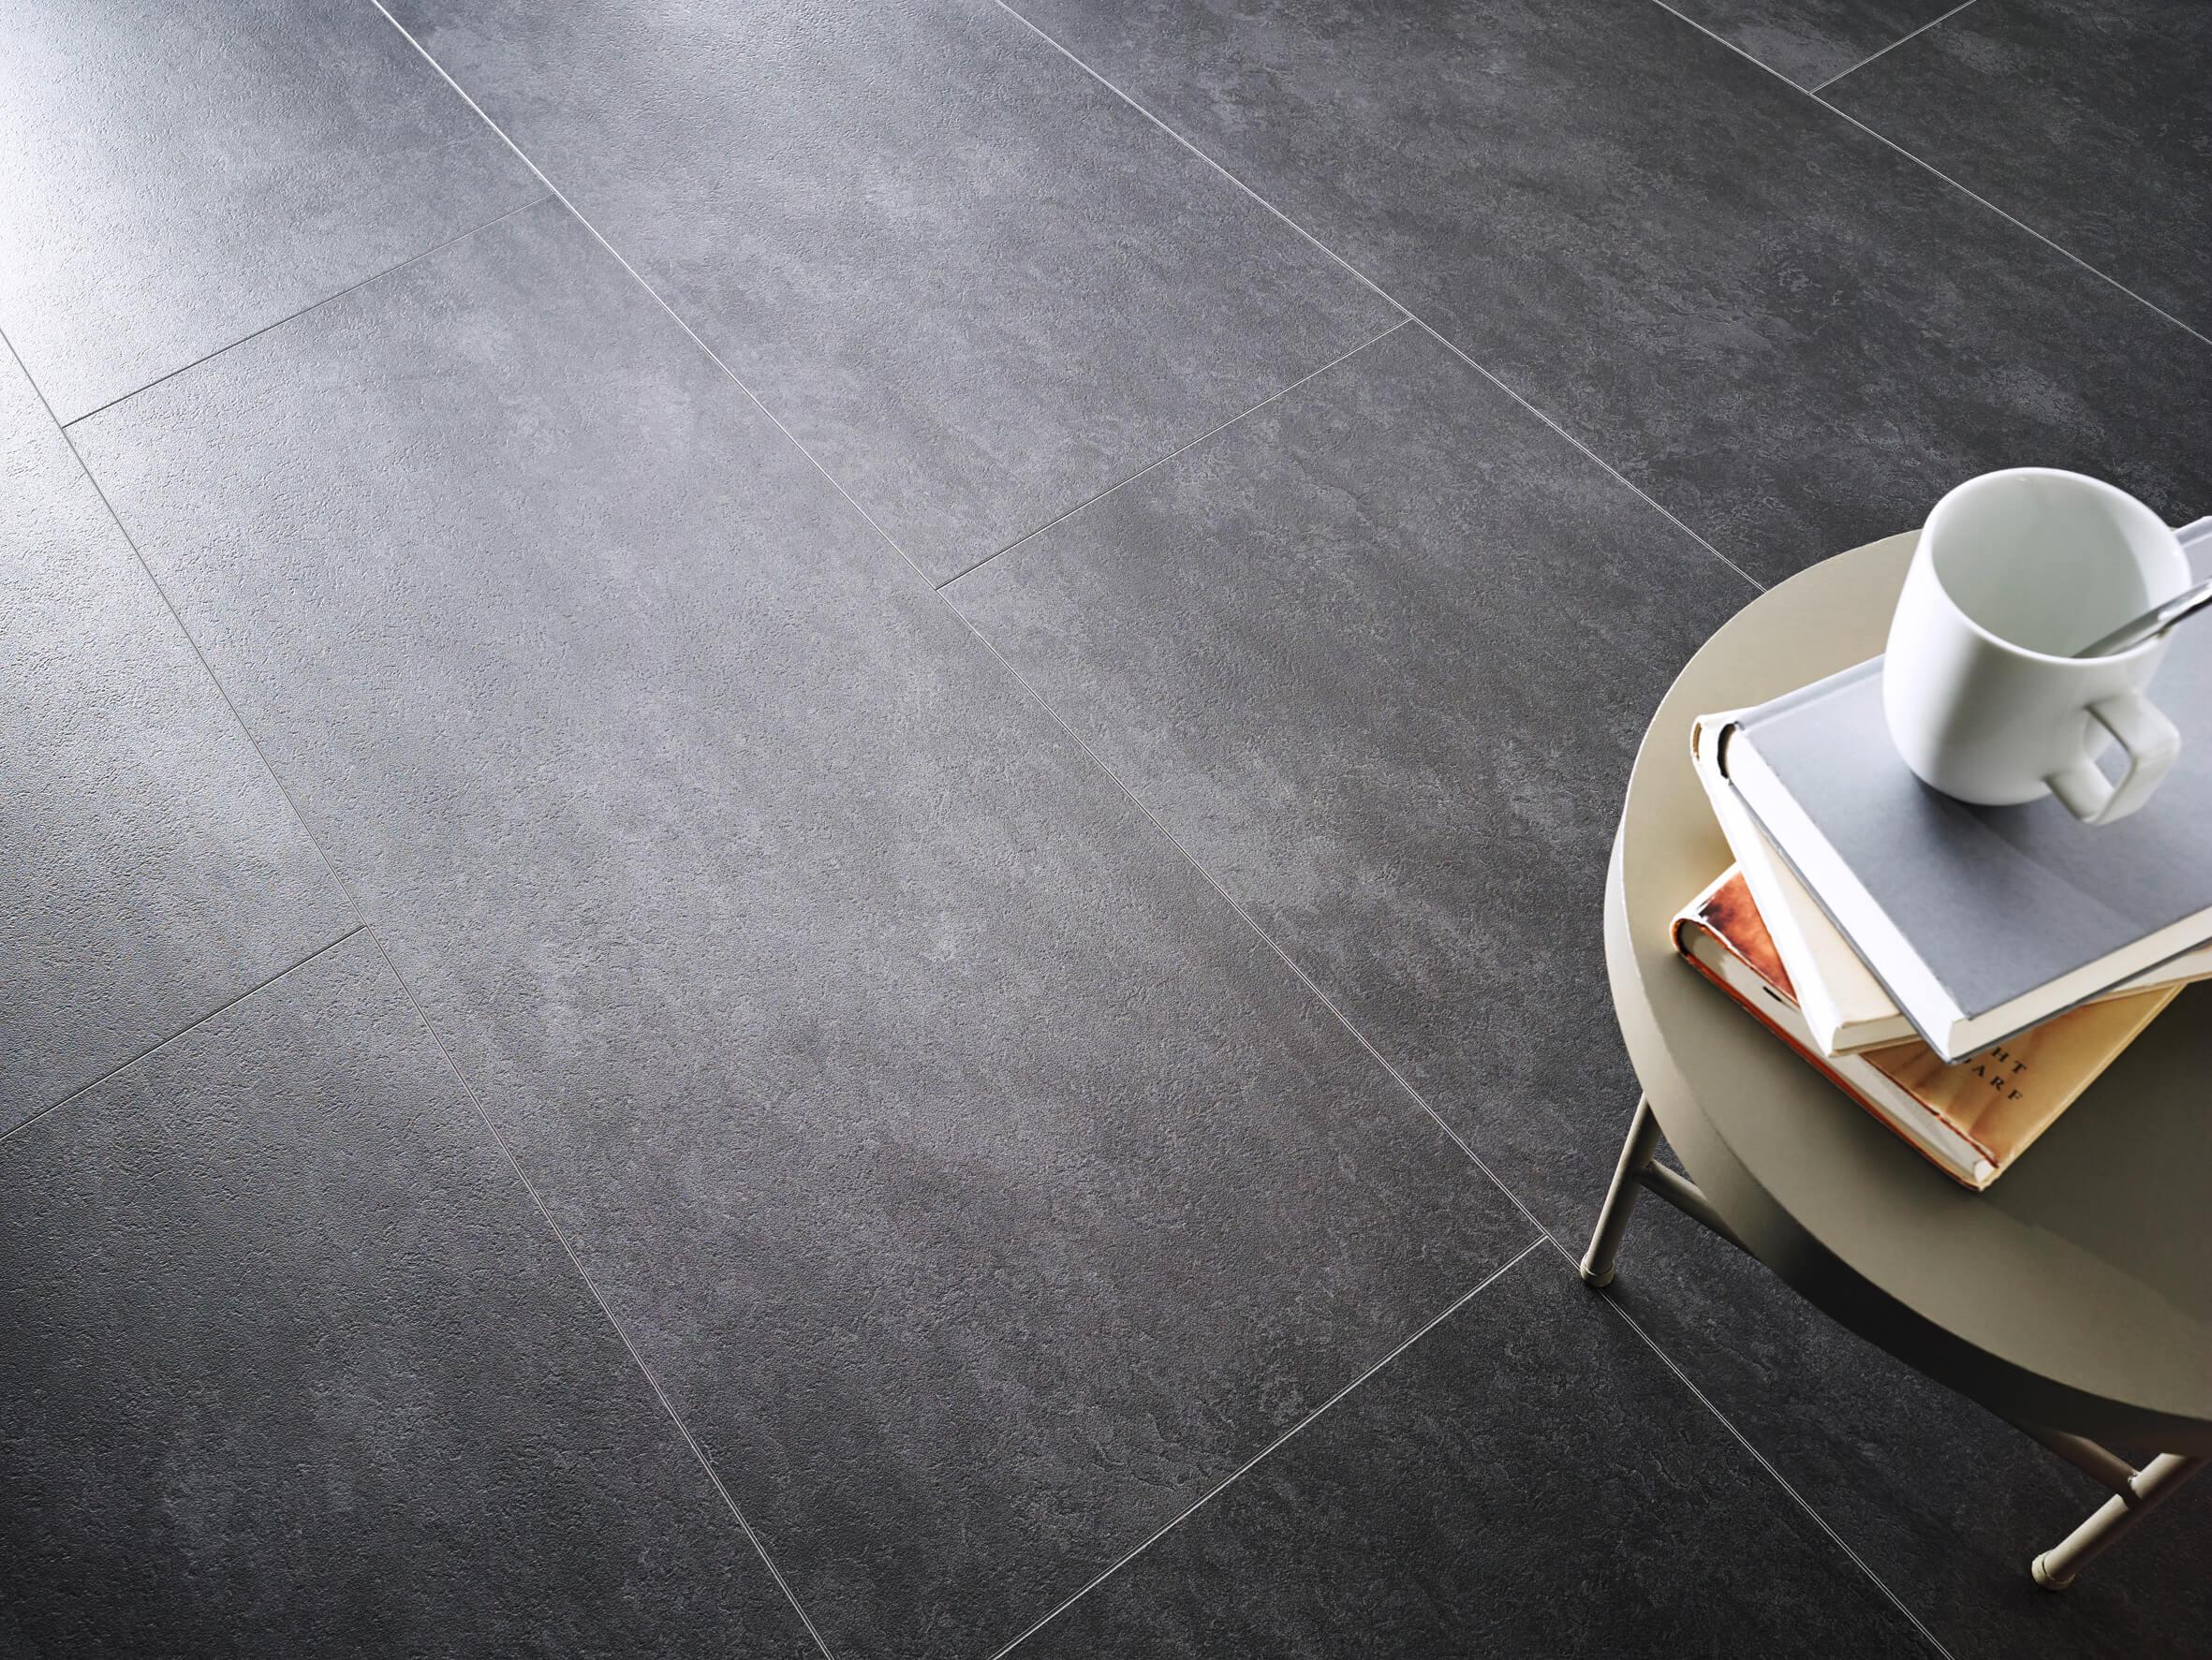 kwg antigua stone vinylboden. Black Bedroom Furniture Sets. Home Design Ideas